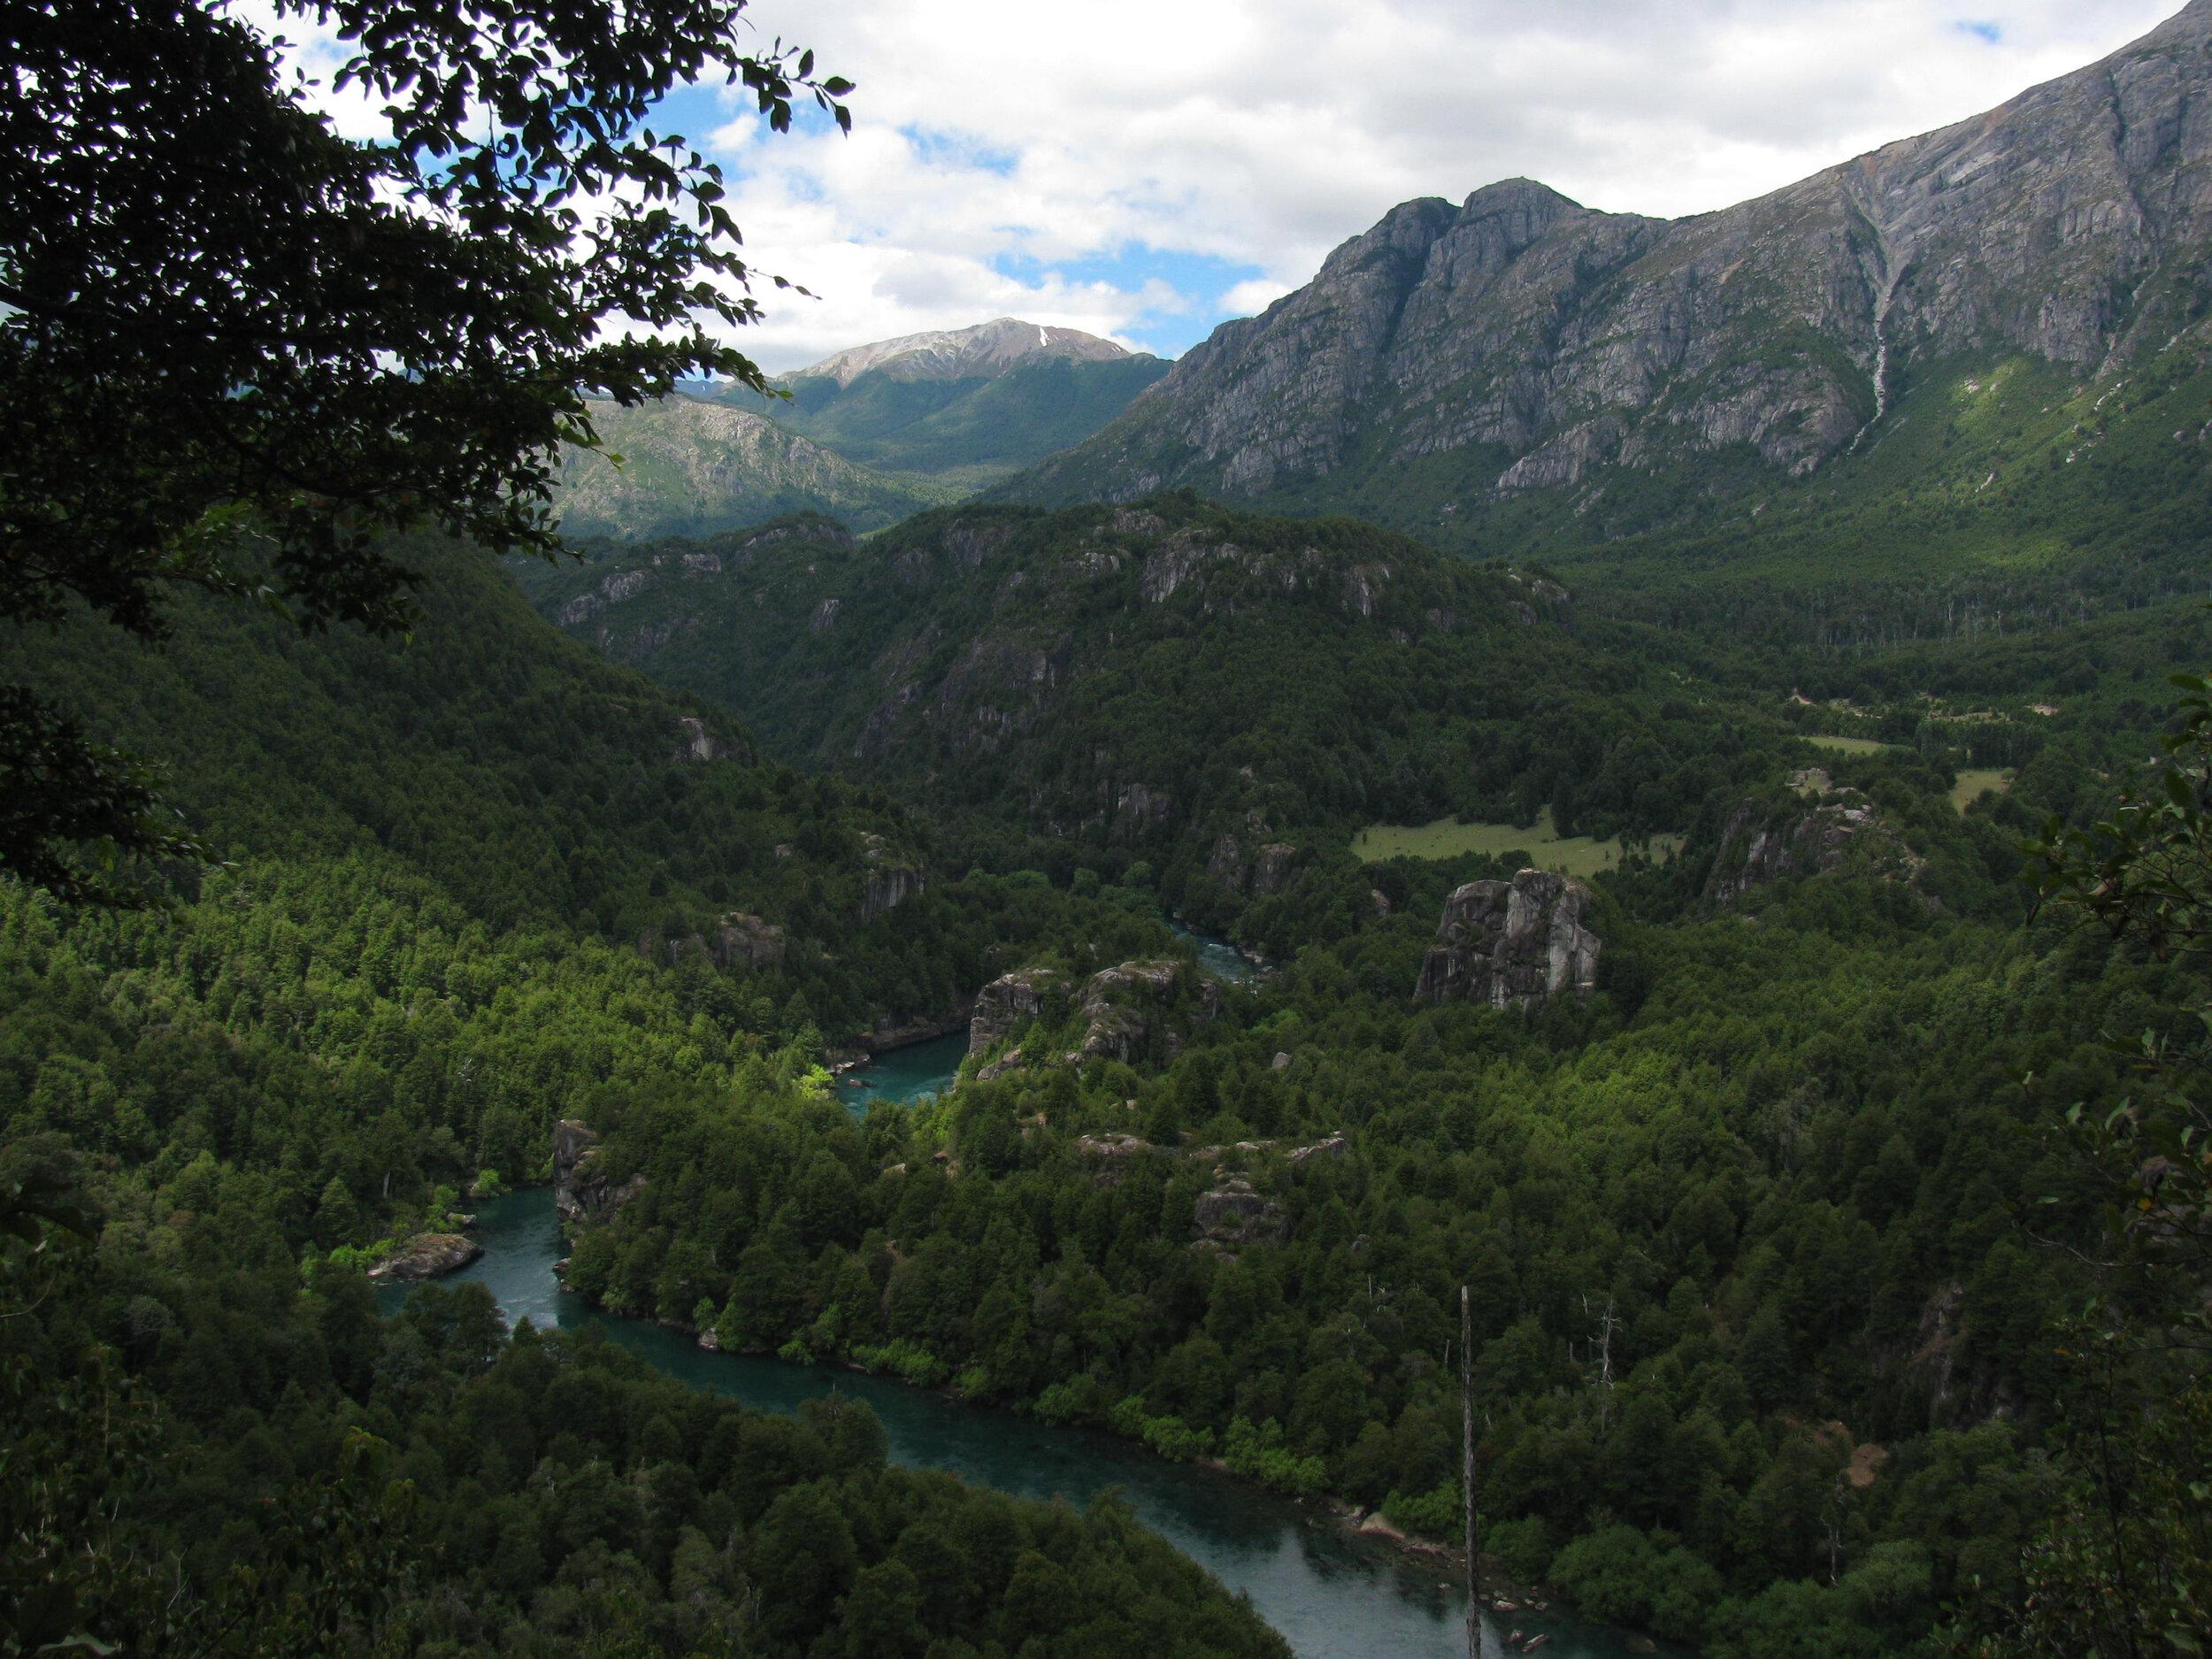 The Futaleufú River in Chile (photo by D. Hertz)